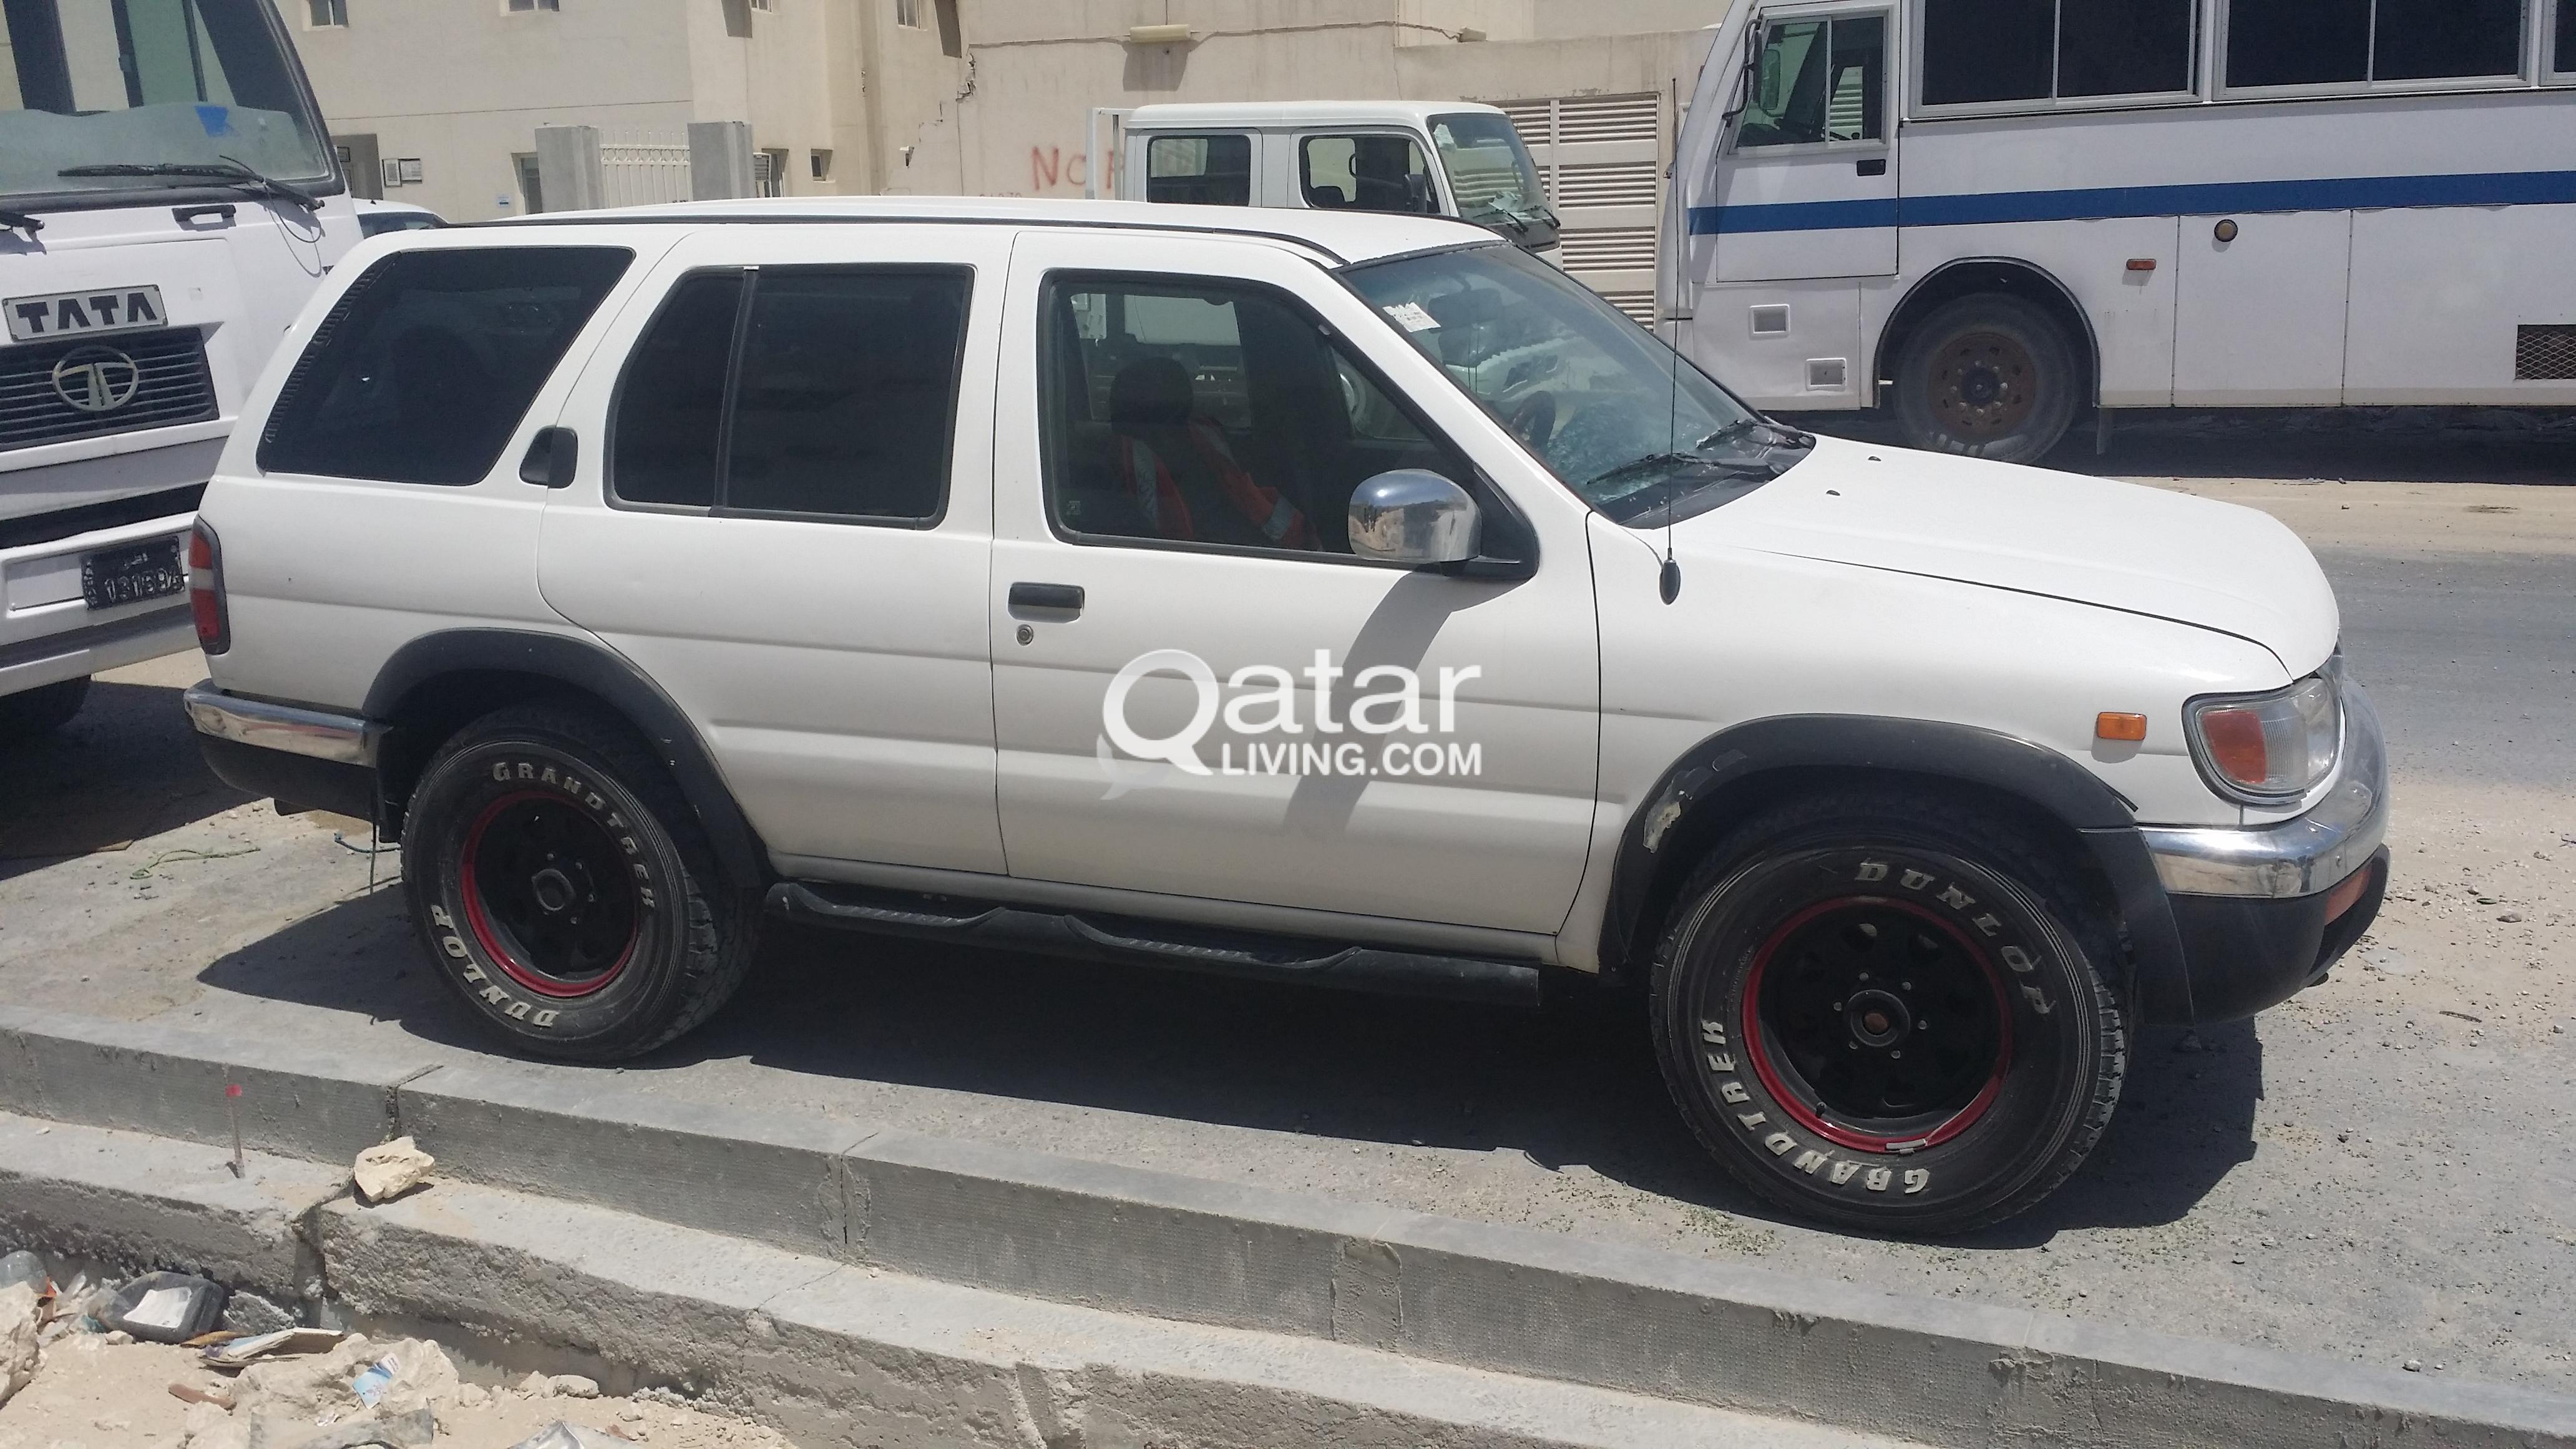 1998 nissan pathfinder | qatar living